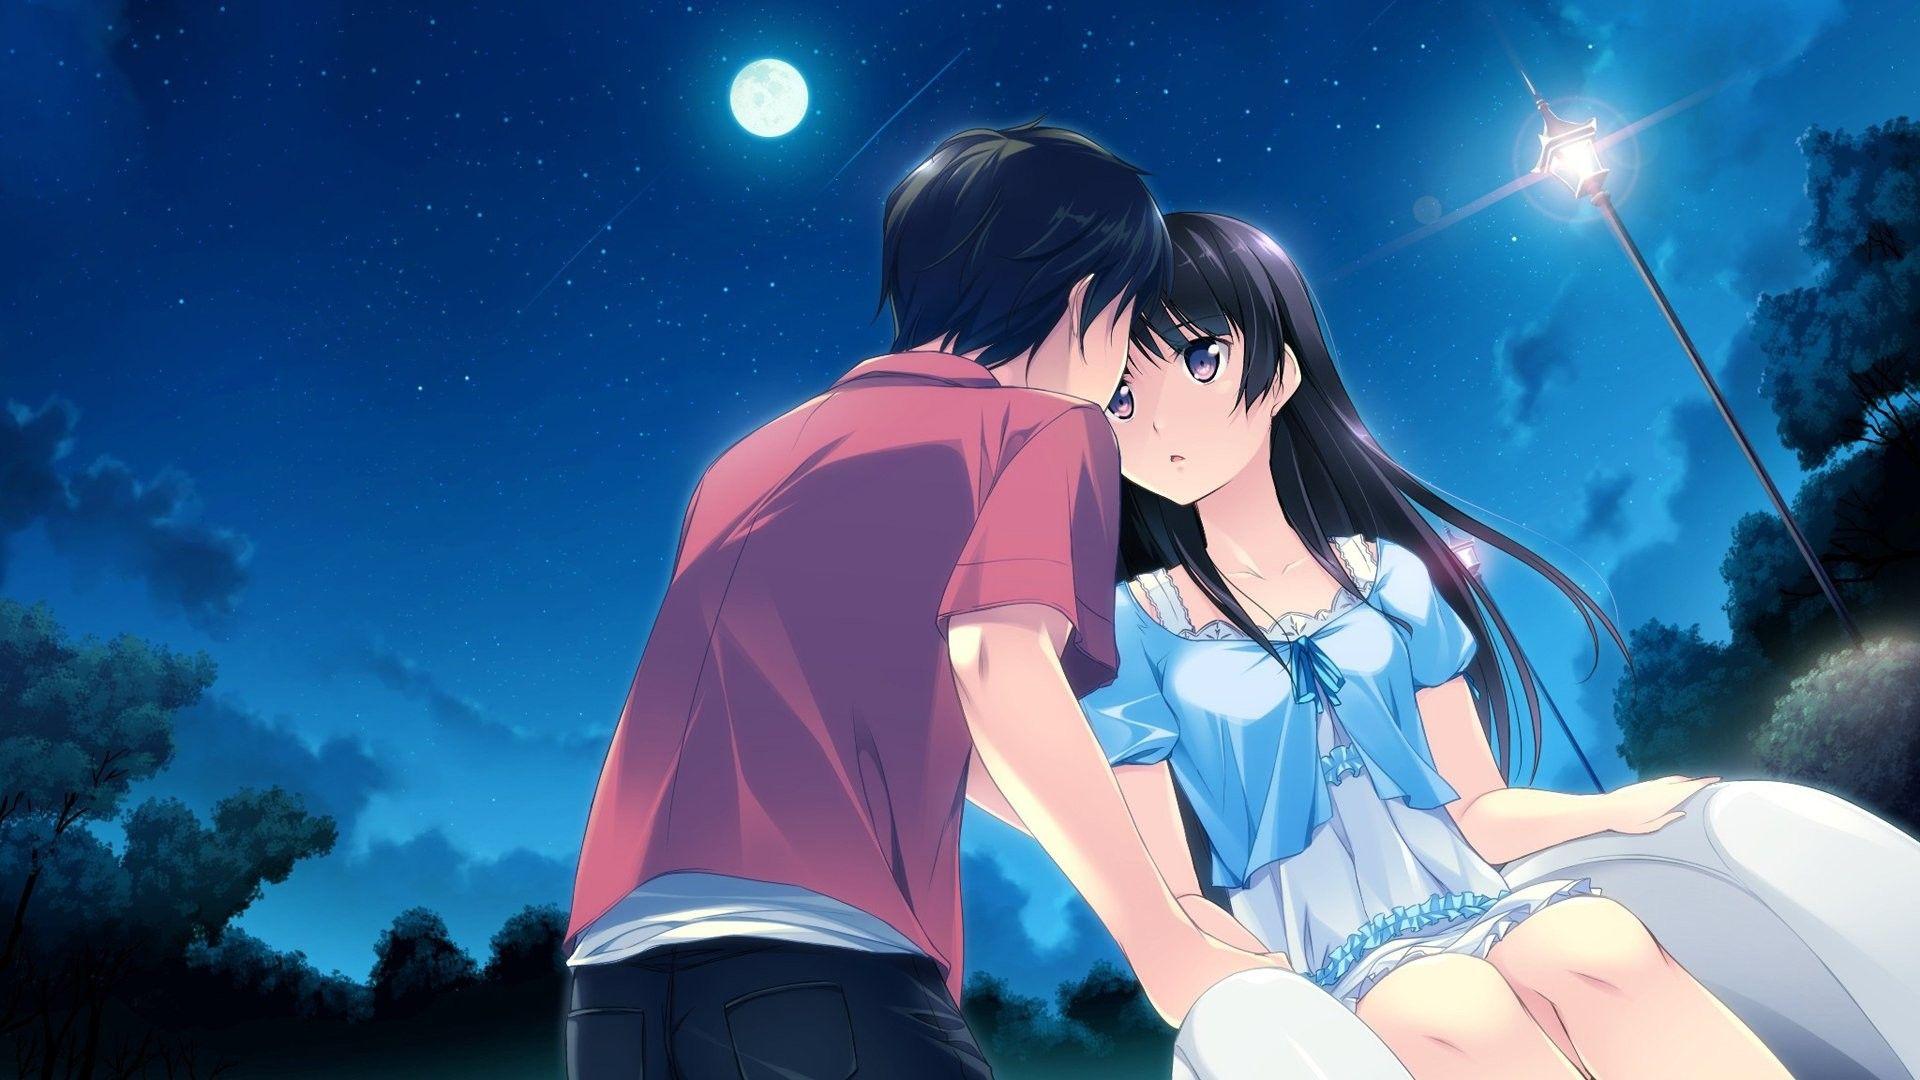 Gambar Anime Romantis Wallpaper Top Anime Wallpaper In 2020 Anime Couple Kiss Romantic Anime Anime Romance